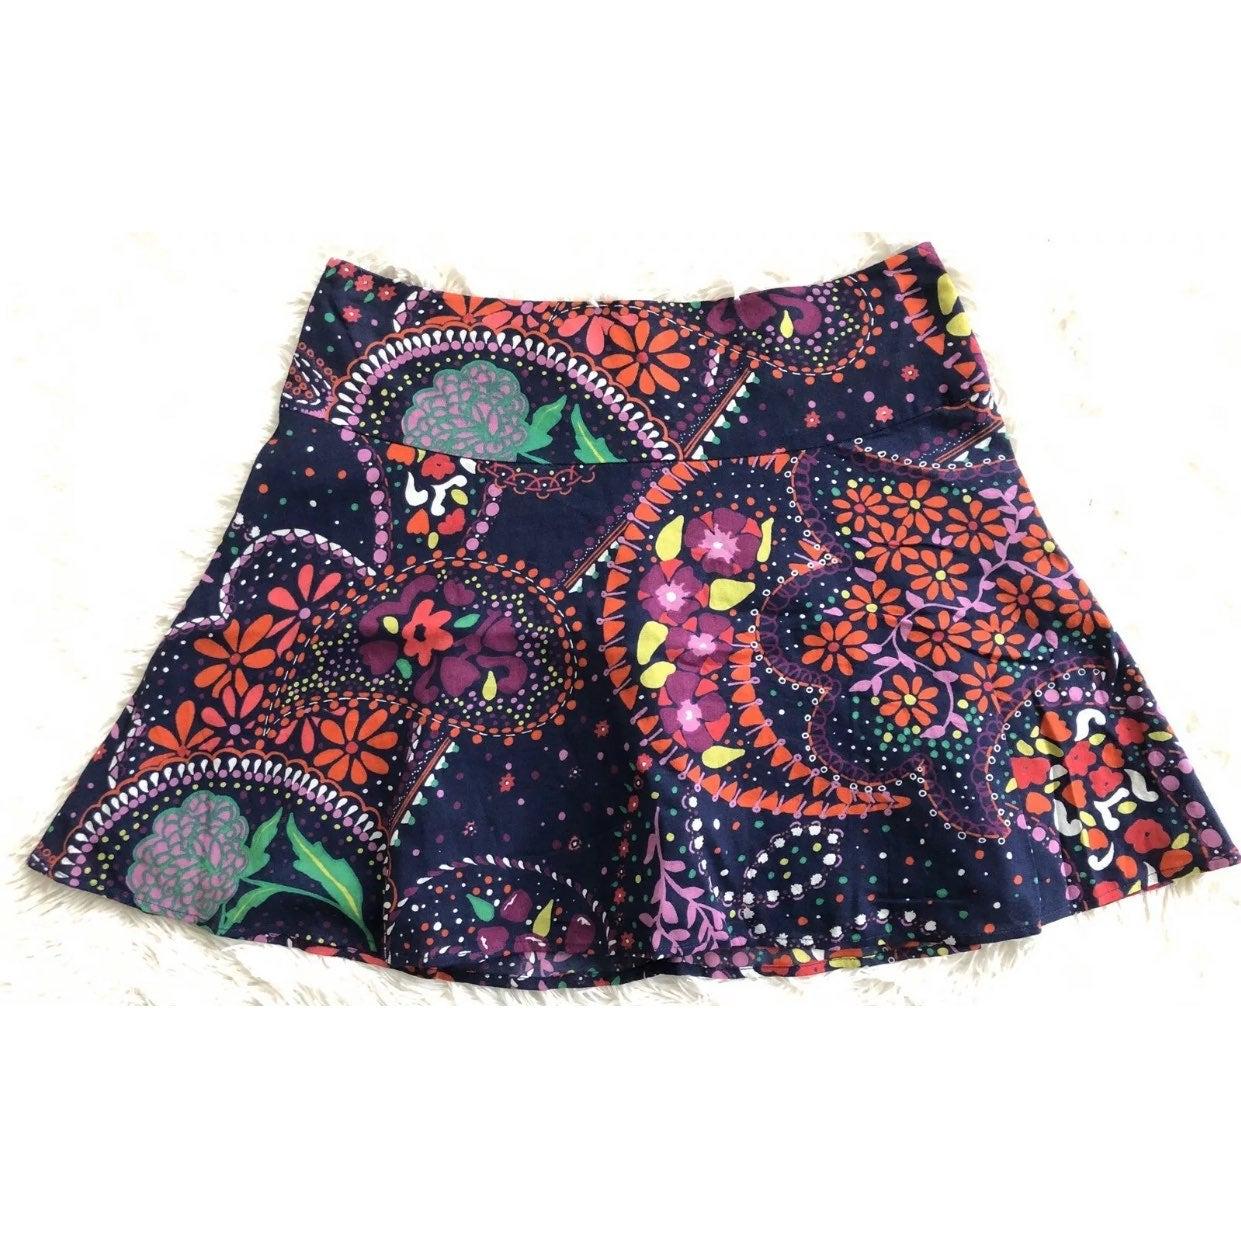 Lilly Pulitzer Navy Print Skater Skirt-8